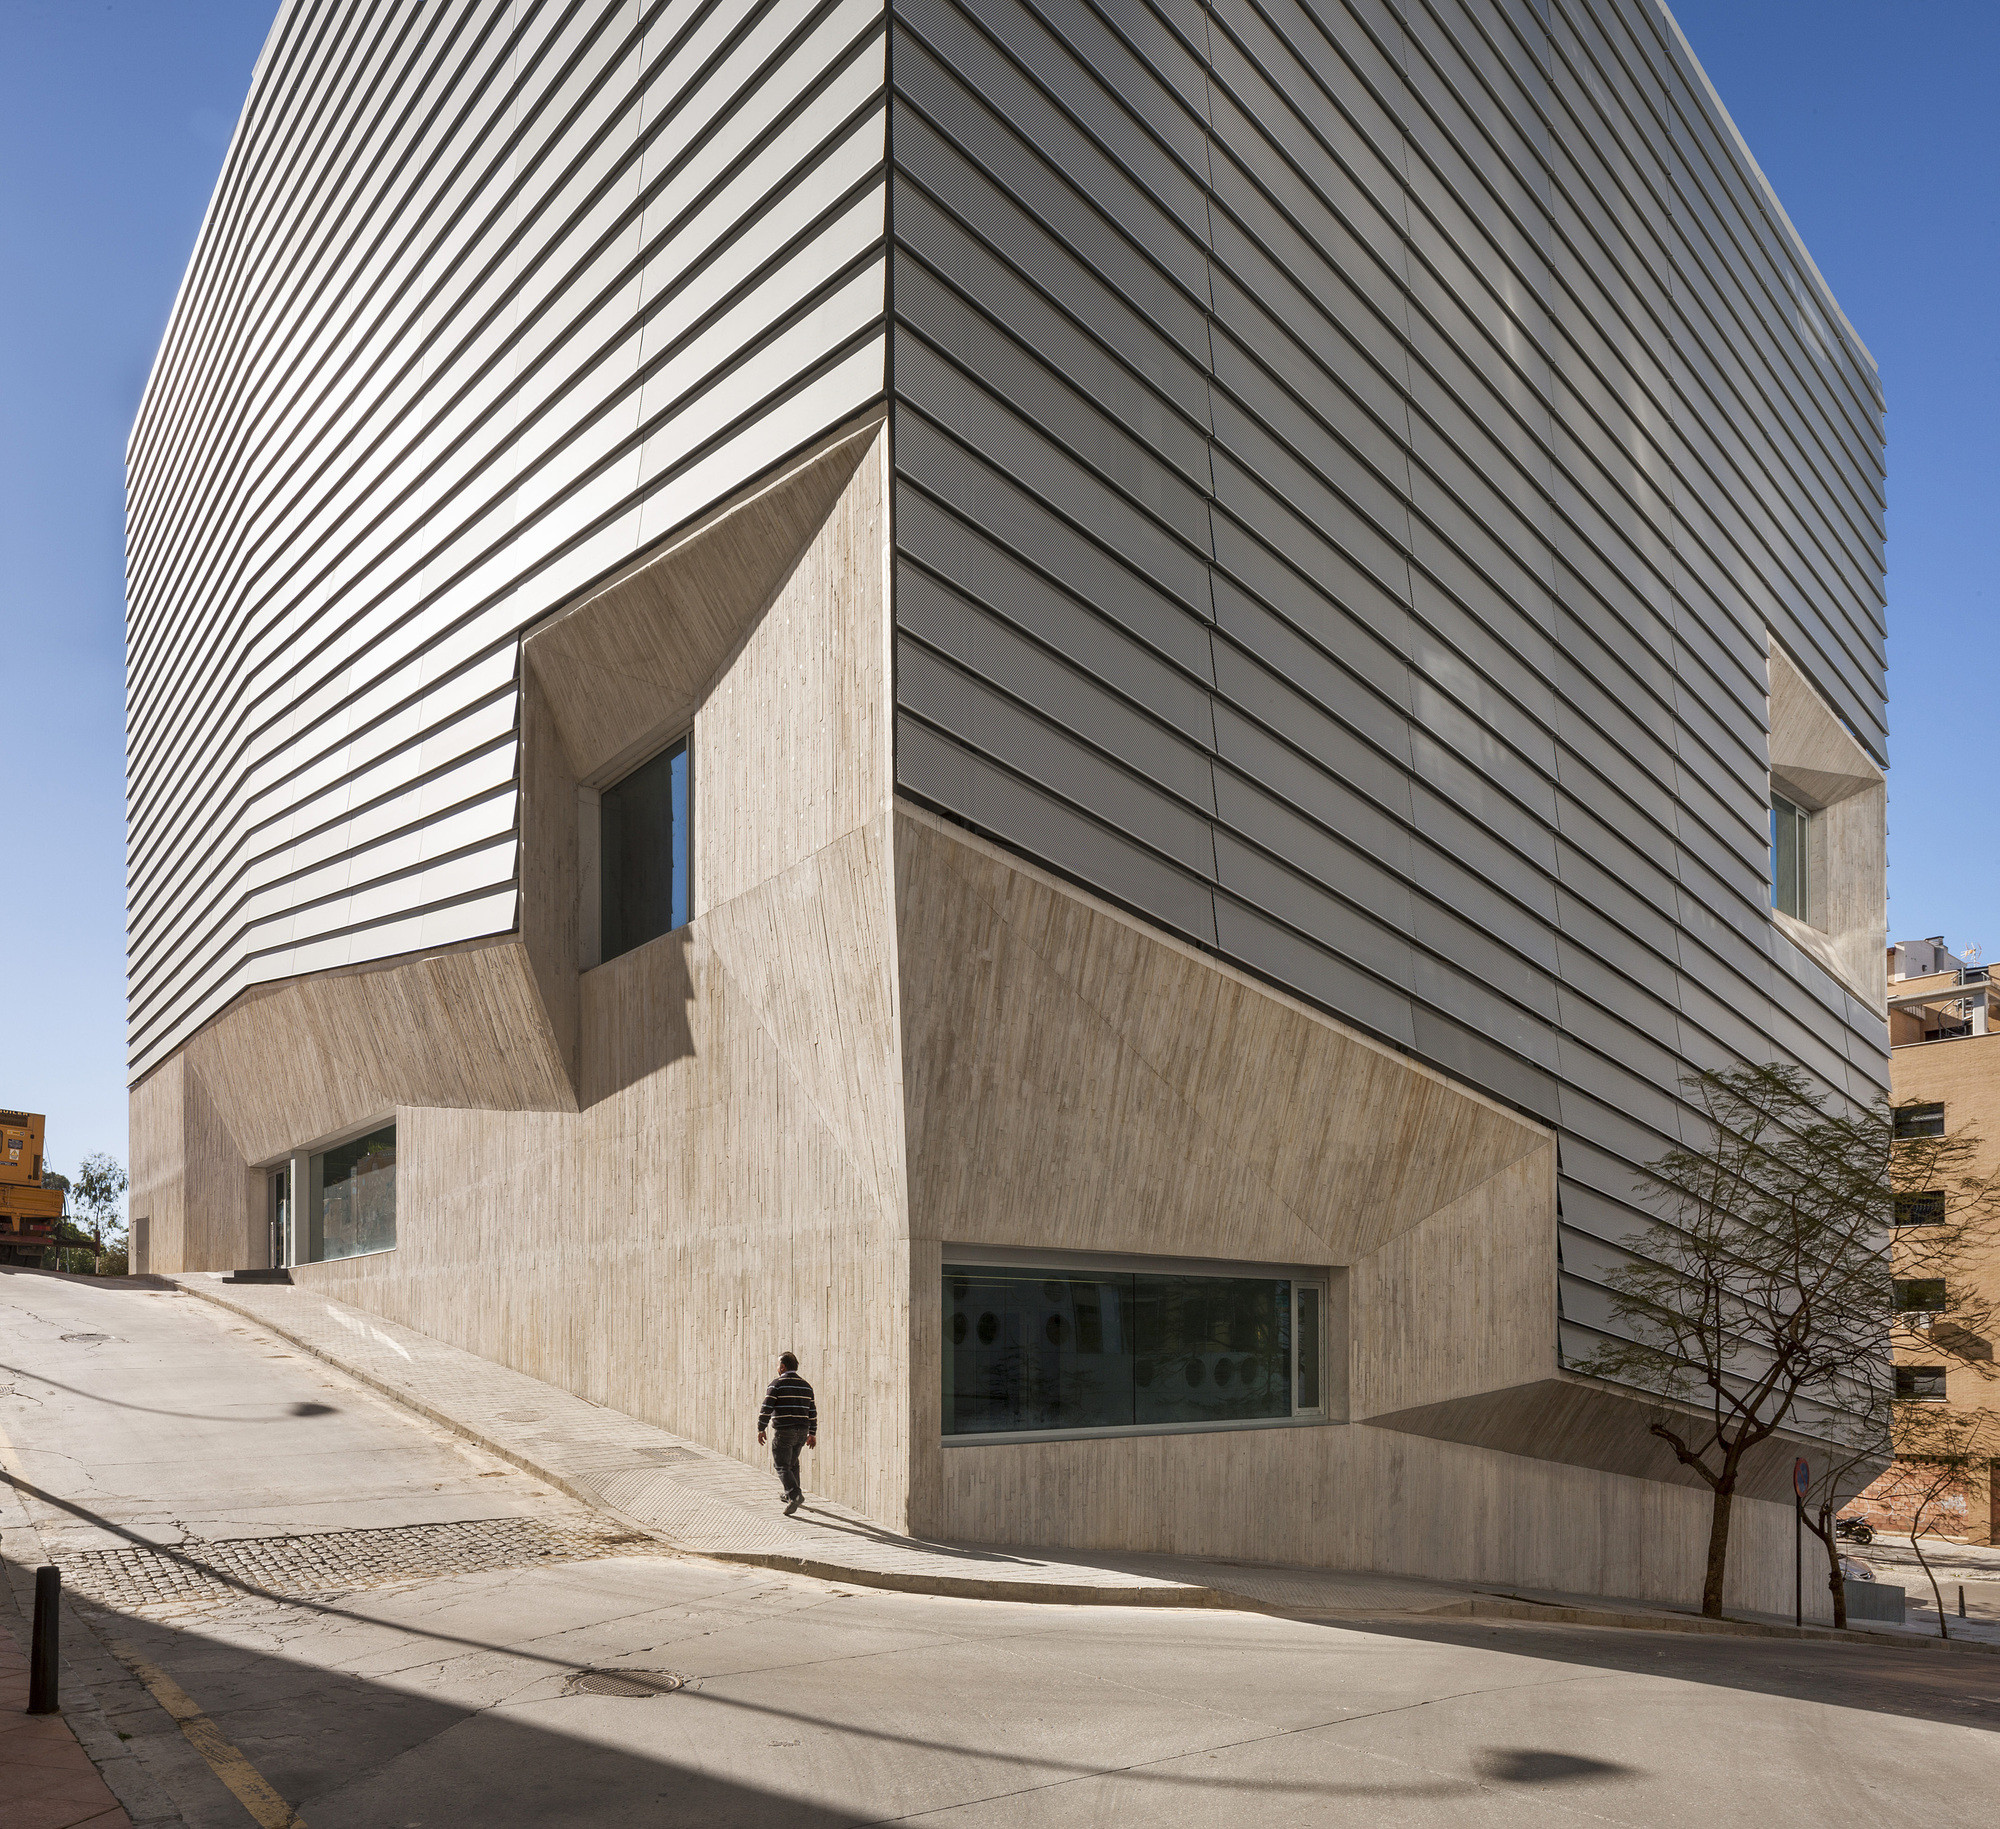 Biblioteca Pública de Ceuta / Paredes Pedrosa. Image © Fernando Alda